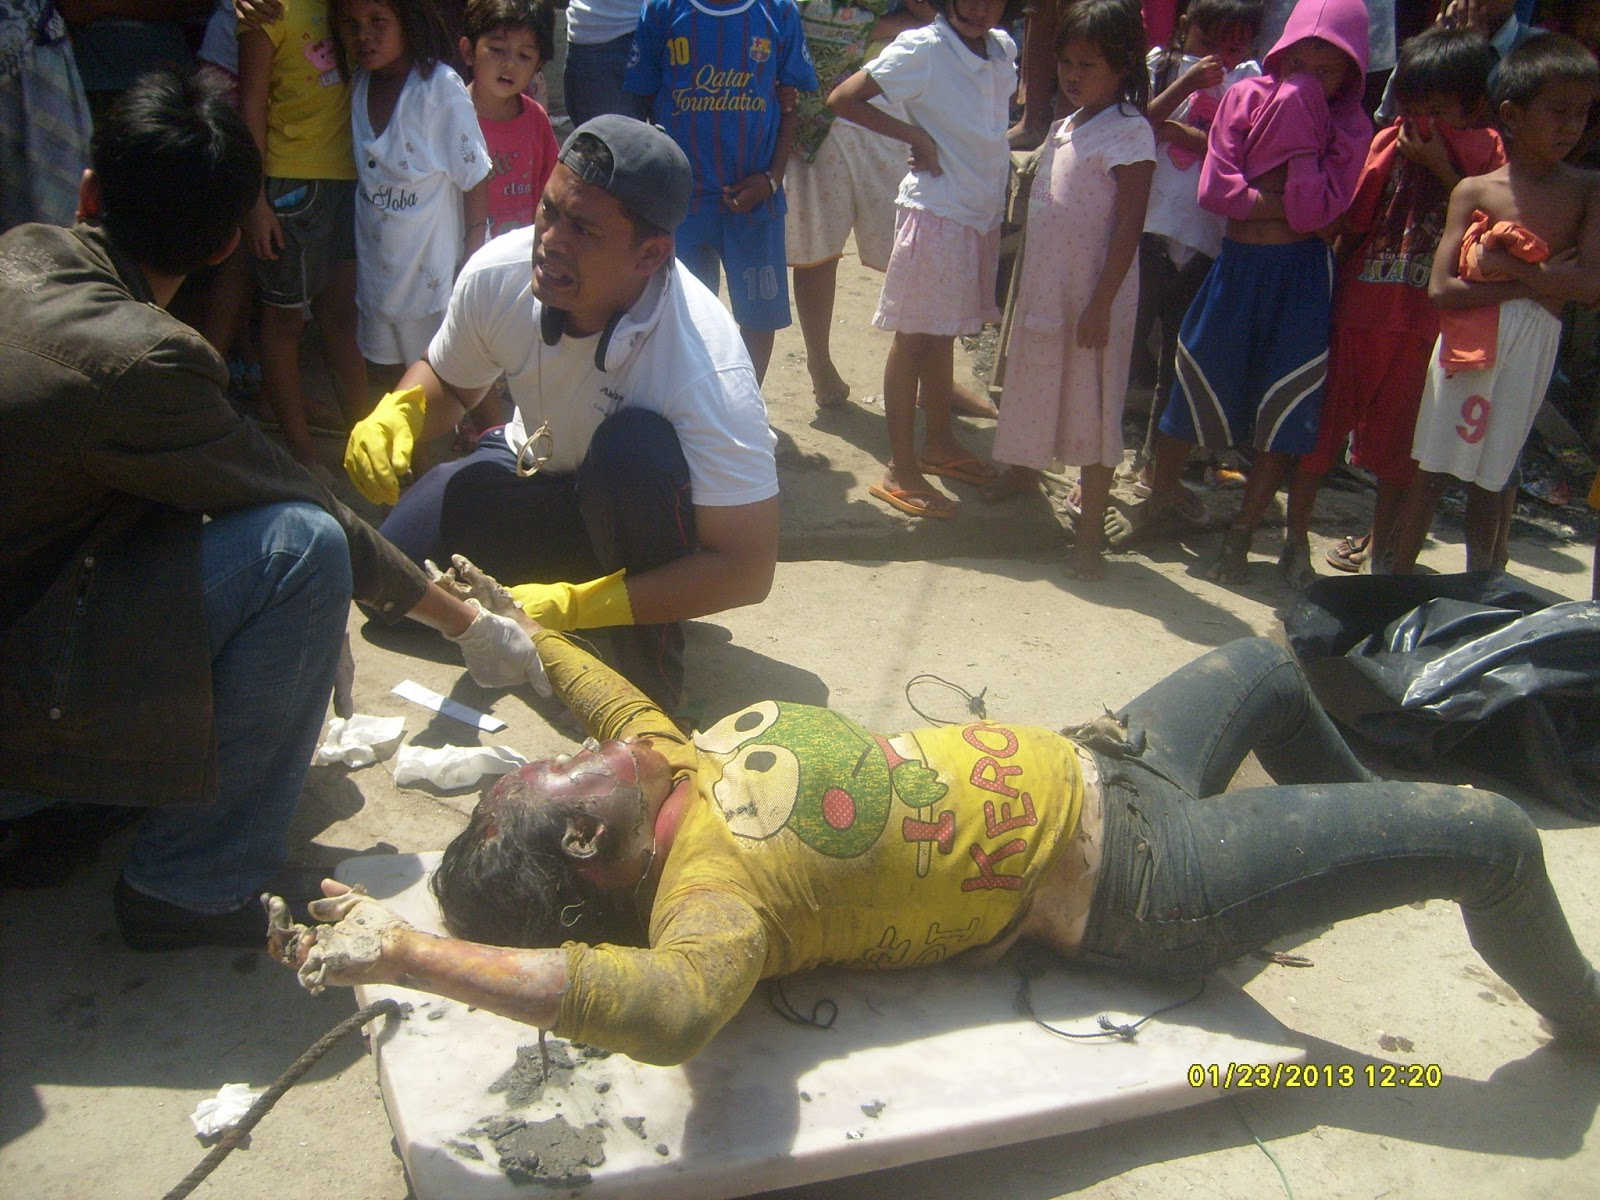 Mayat Wanita Berkaos Kuning Mengapung Di Bagan Serdang - mashuri